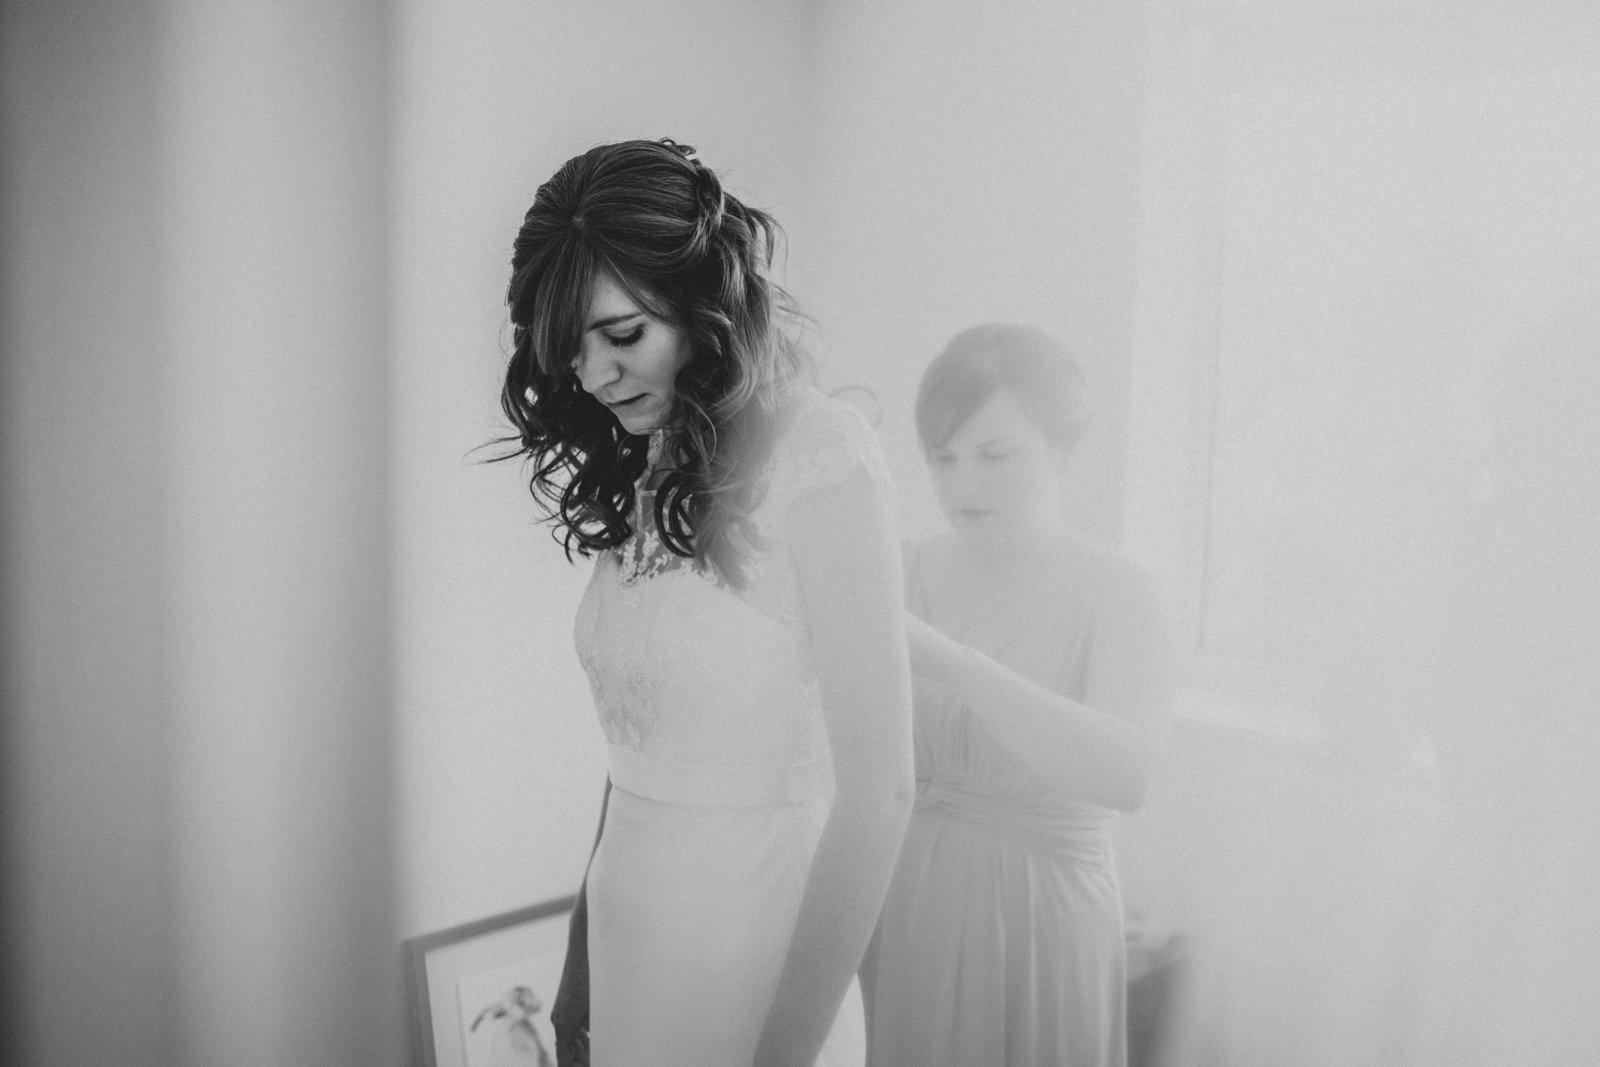 Bridesmaid helping bride into dress - Yorkshire Wedding Photographer Jono Symonds